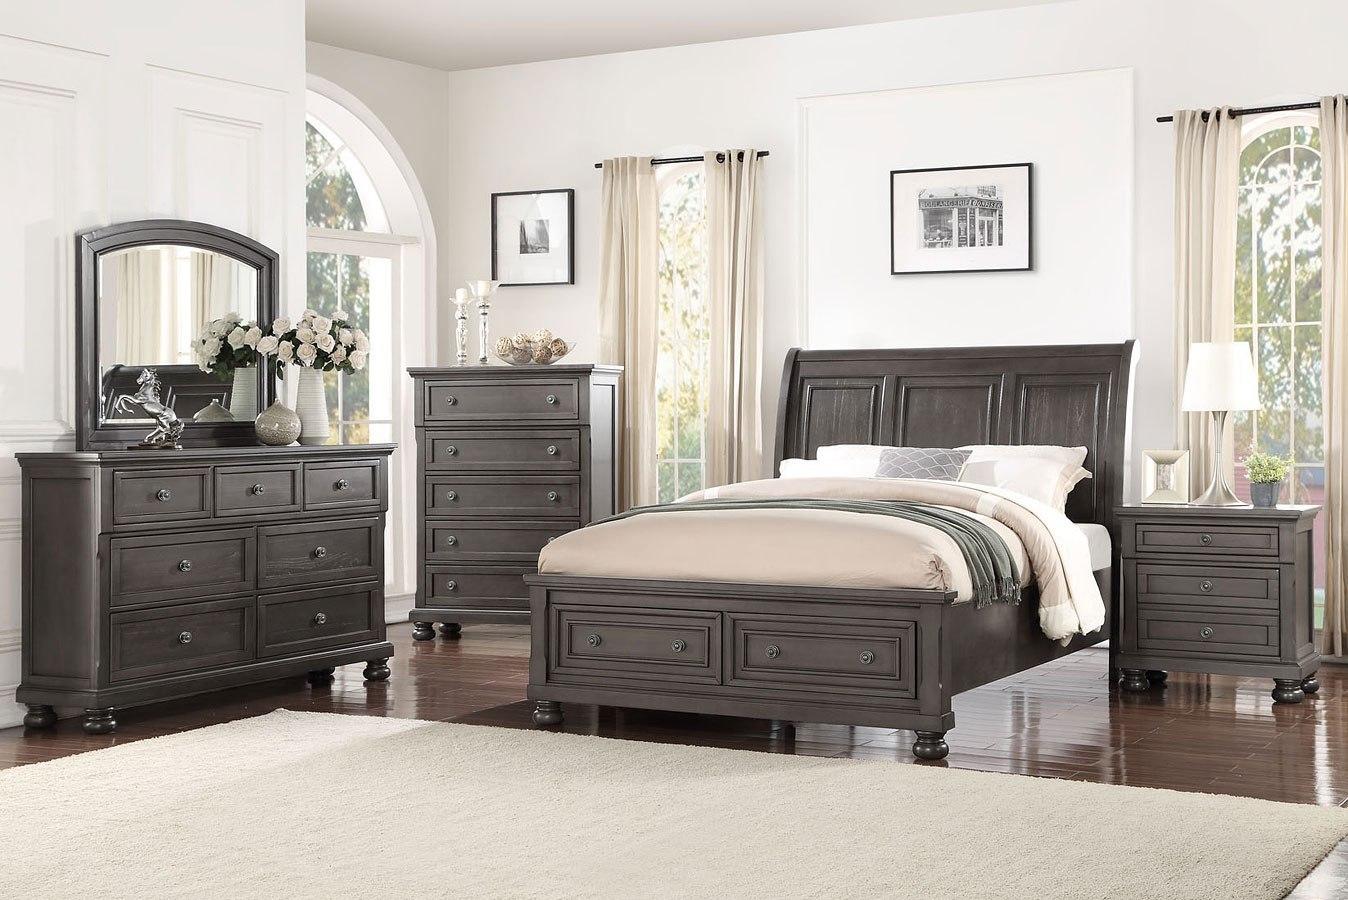 Soriah Sleigh Storage Bedroom Set By Avalon Furniture Furniturepick